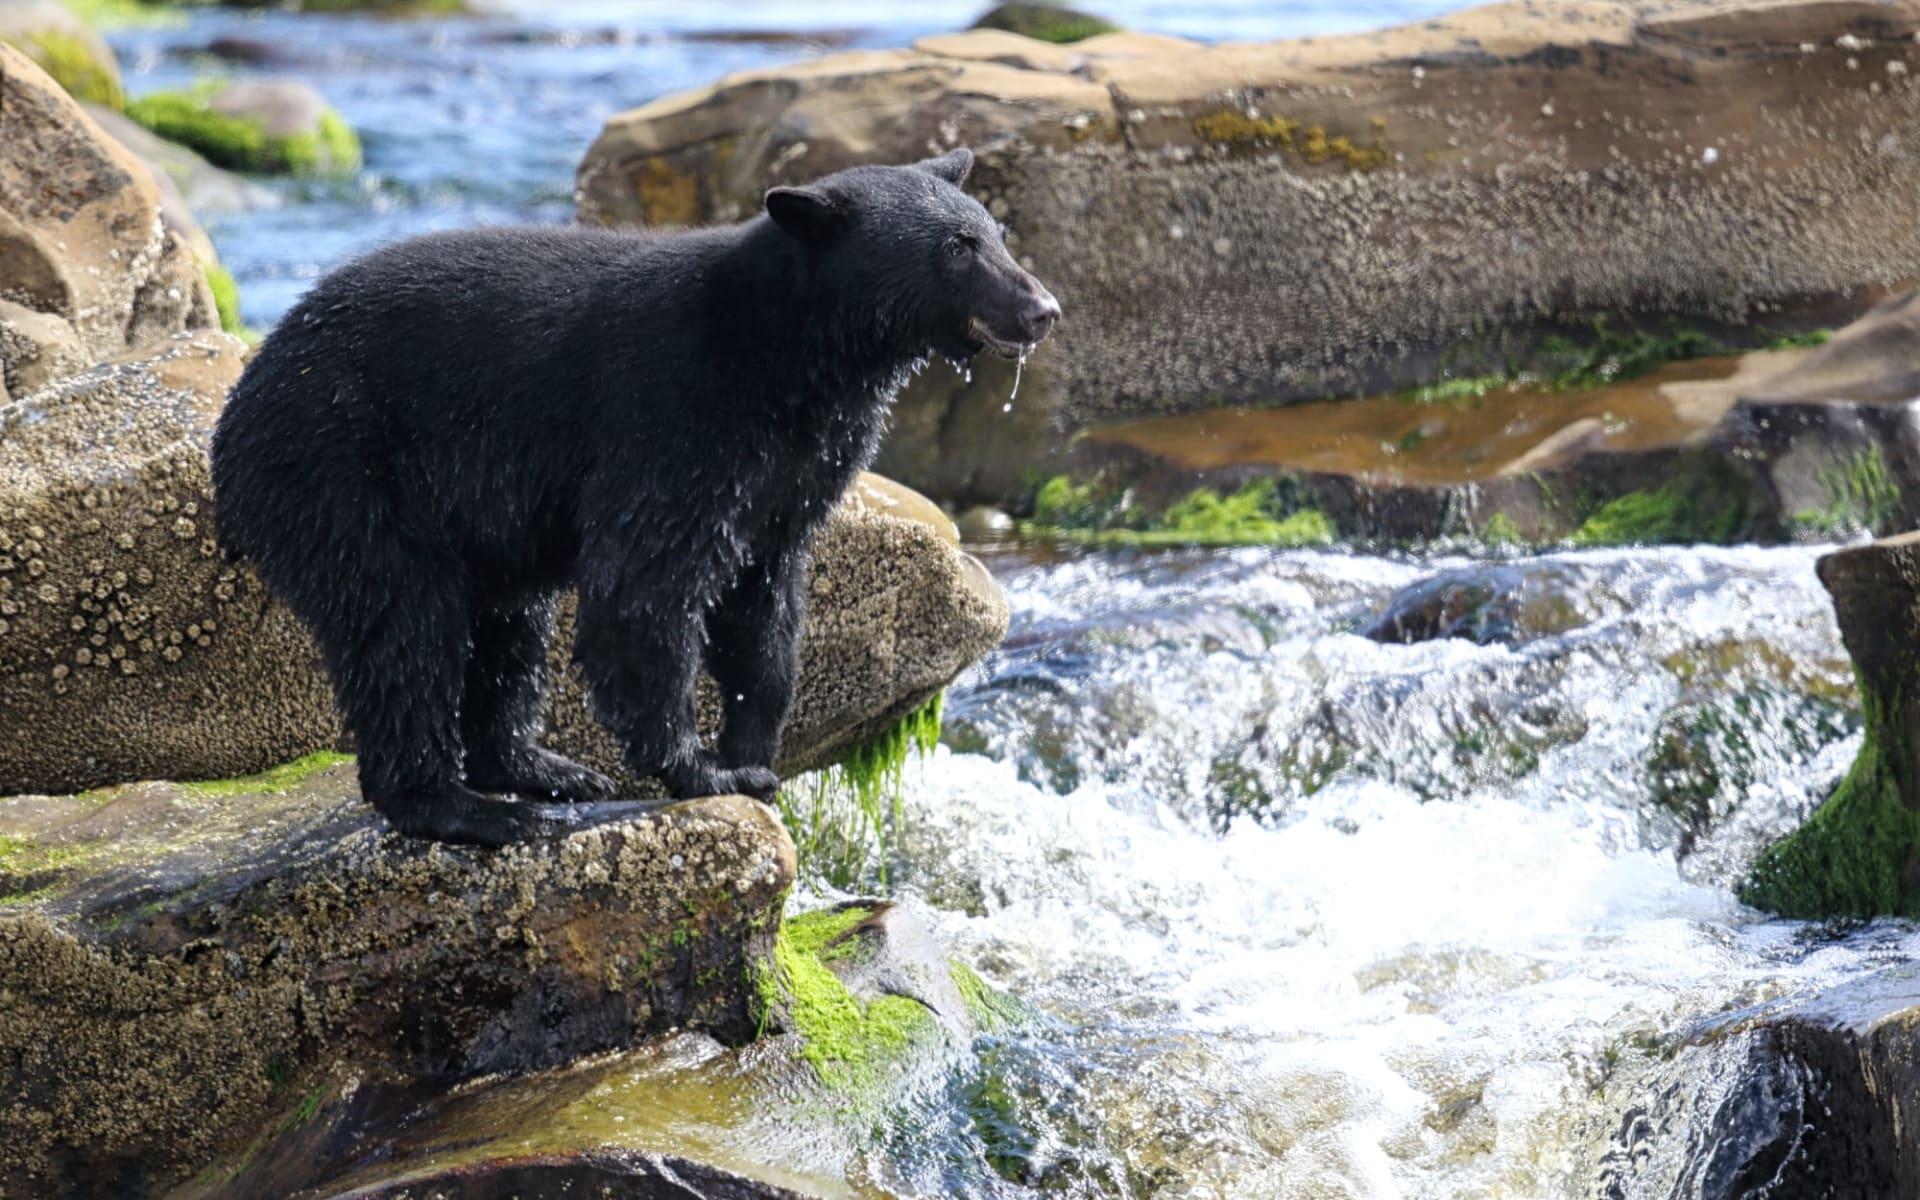 Okwari Tierbeobachtung ab La Baie: Kanada - Vancouver Island - wilder Schwarzbär  am Fisch fangen